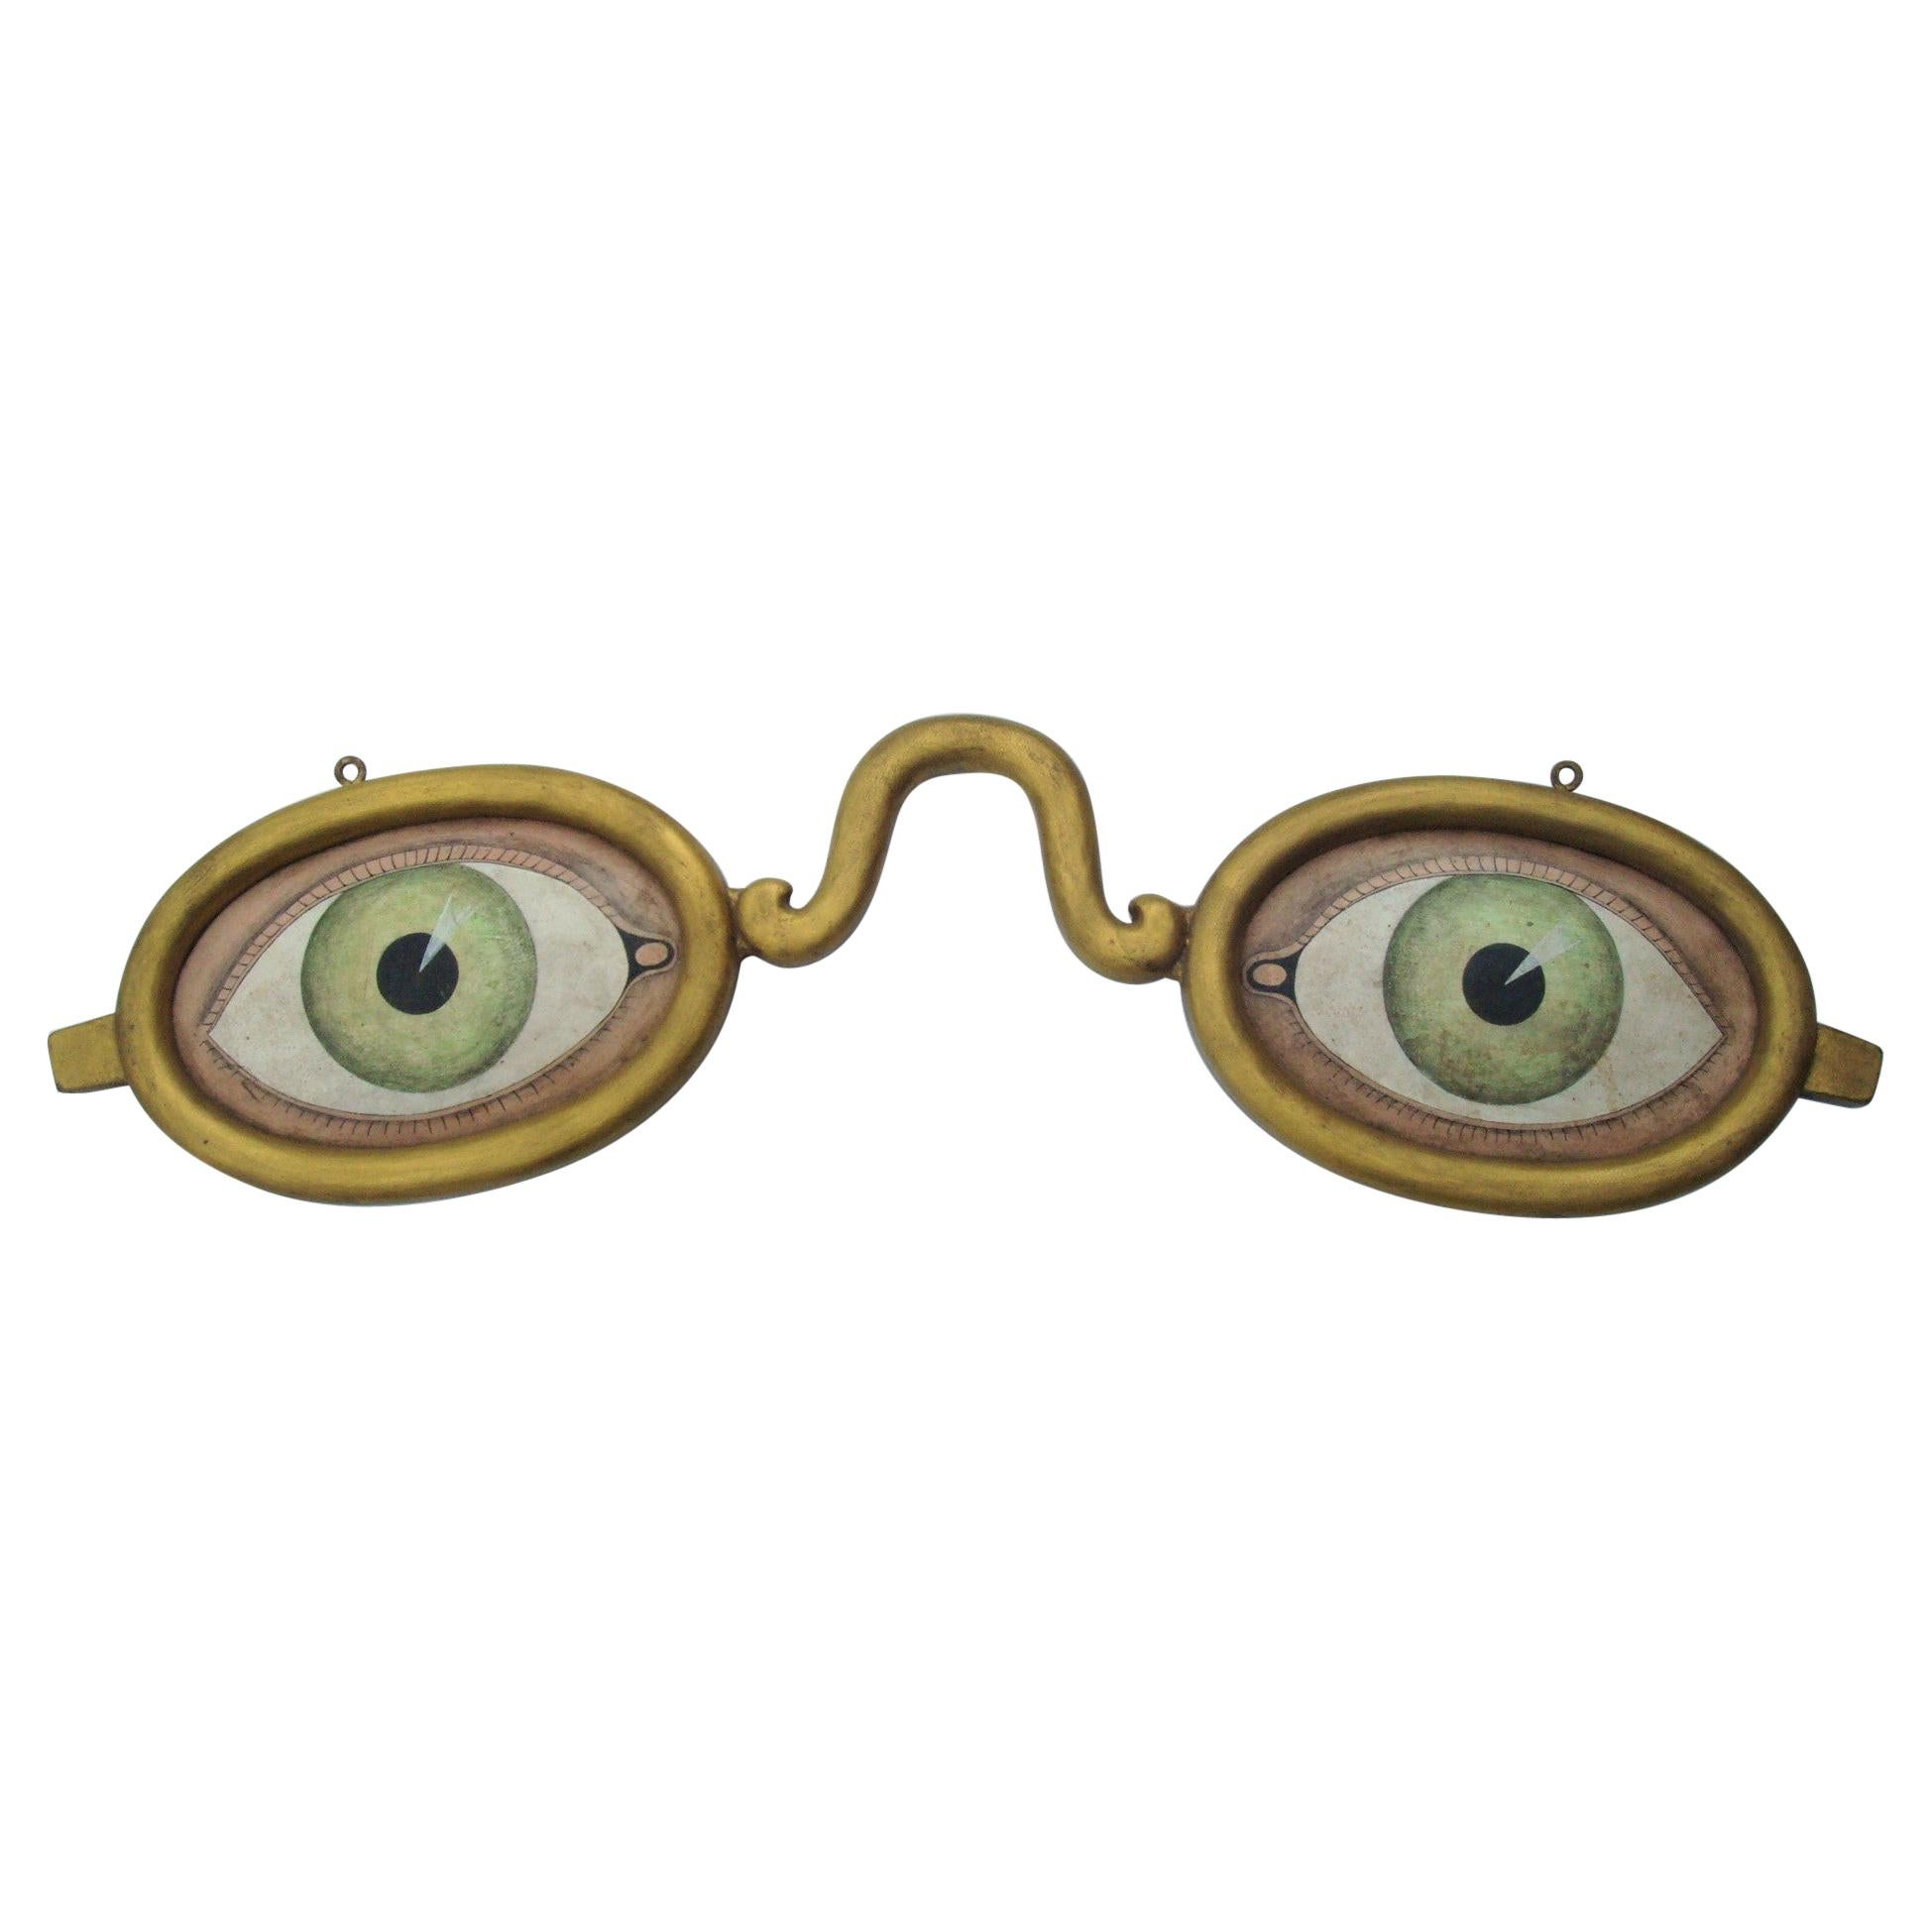 Folk Art Decorative Spectacles, Eyeglasses Optometrist Trade Sign